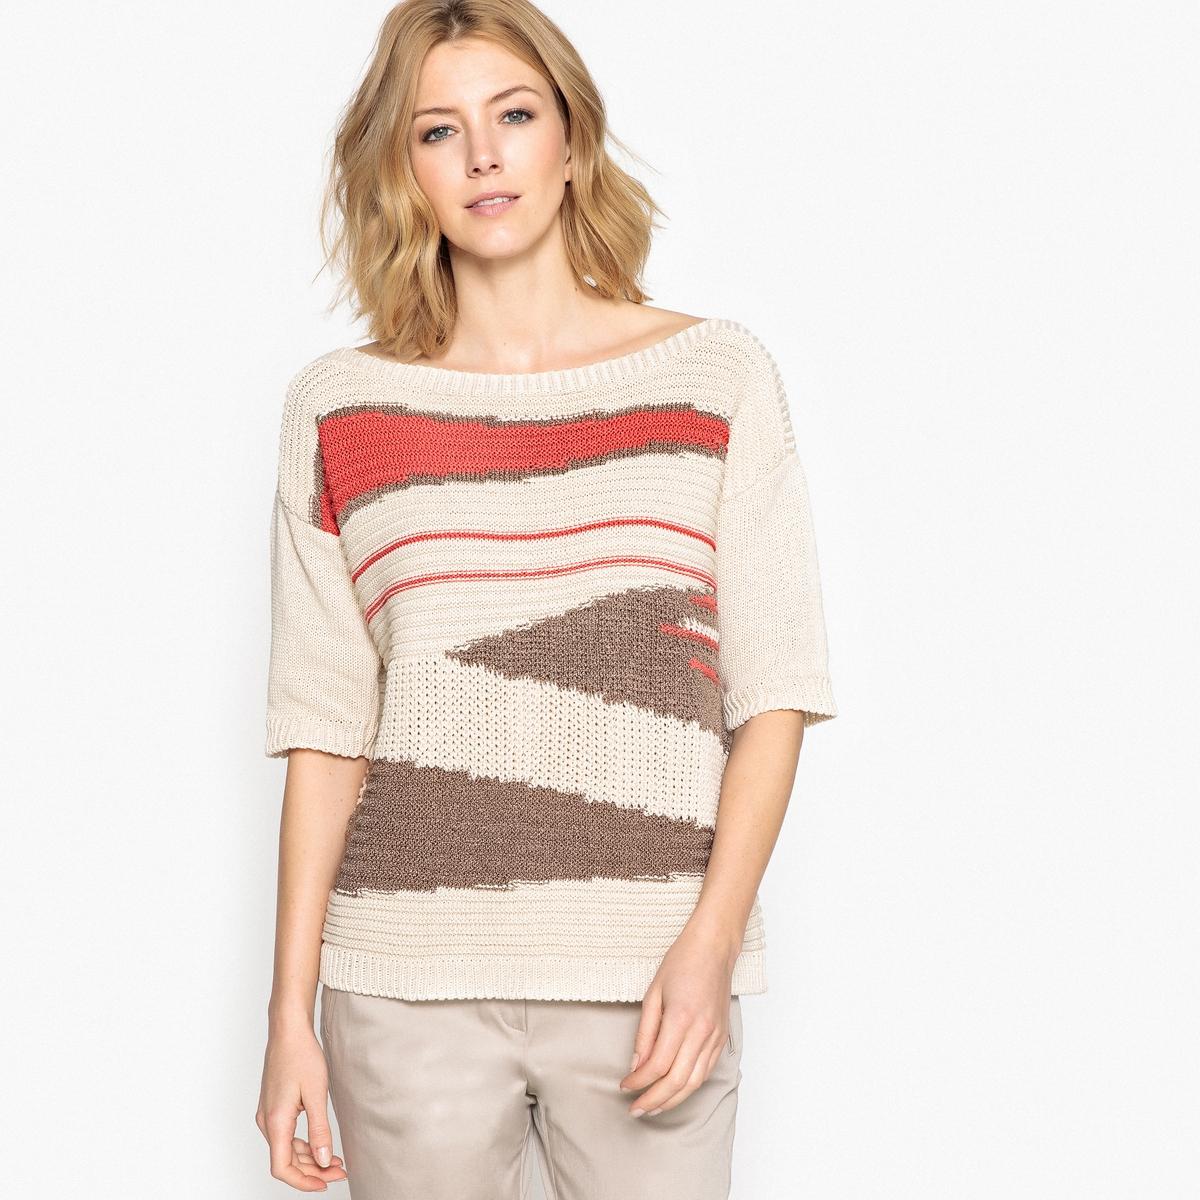 Пуловер с короткими рукавами из оригинального трикотажа